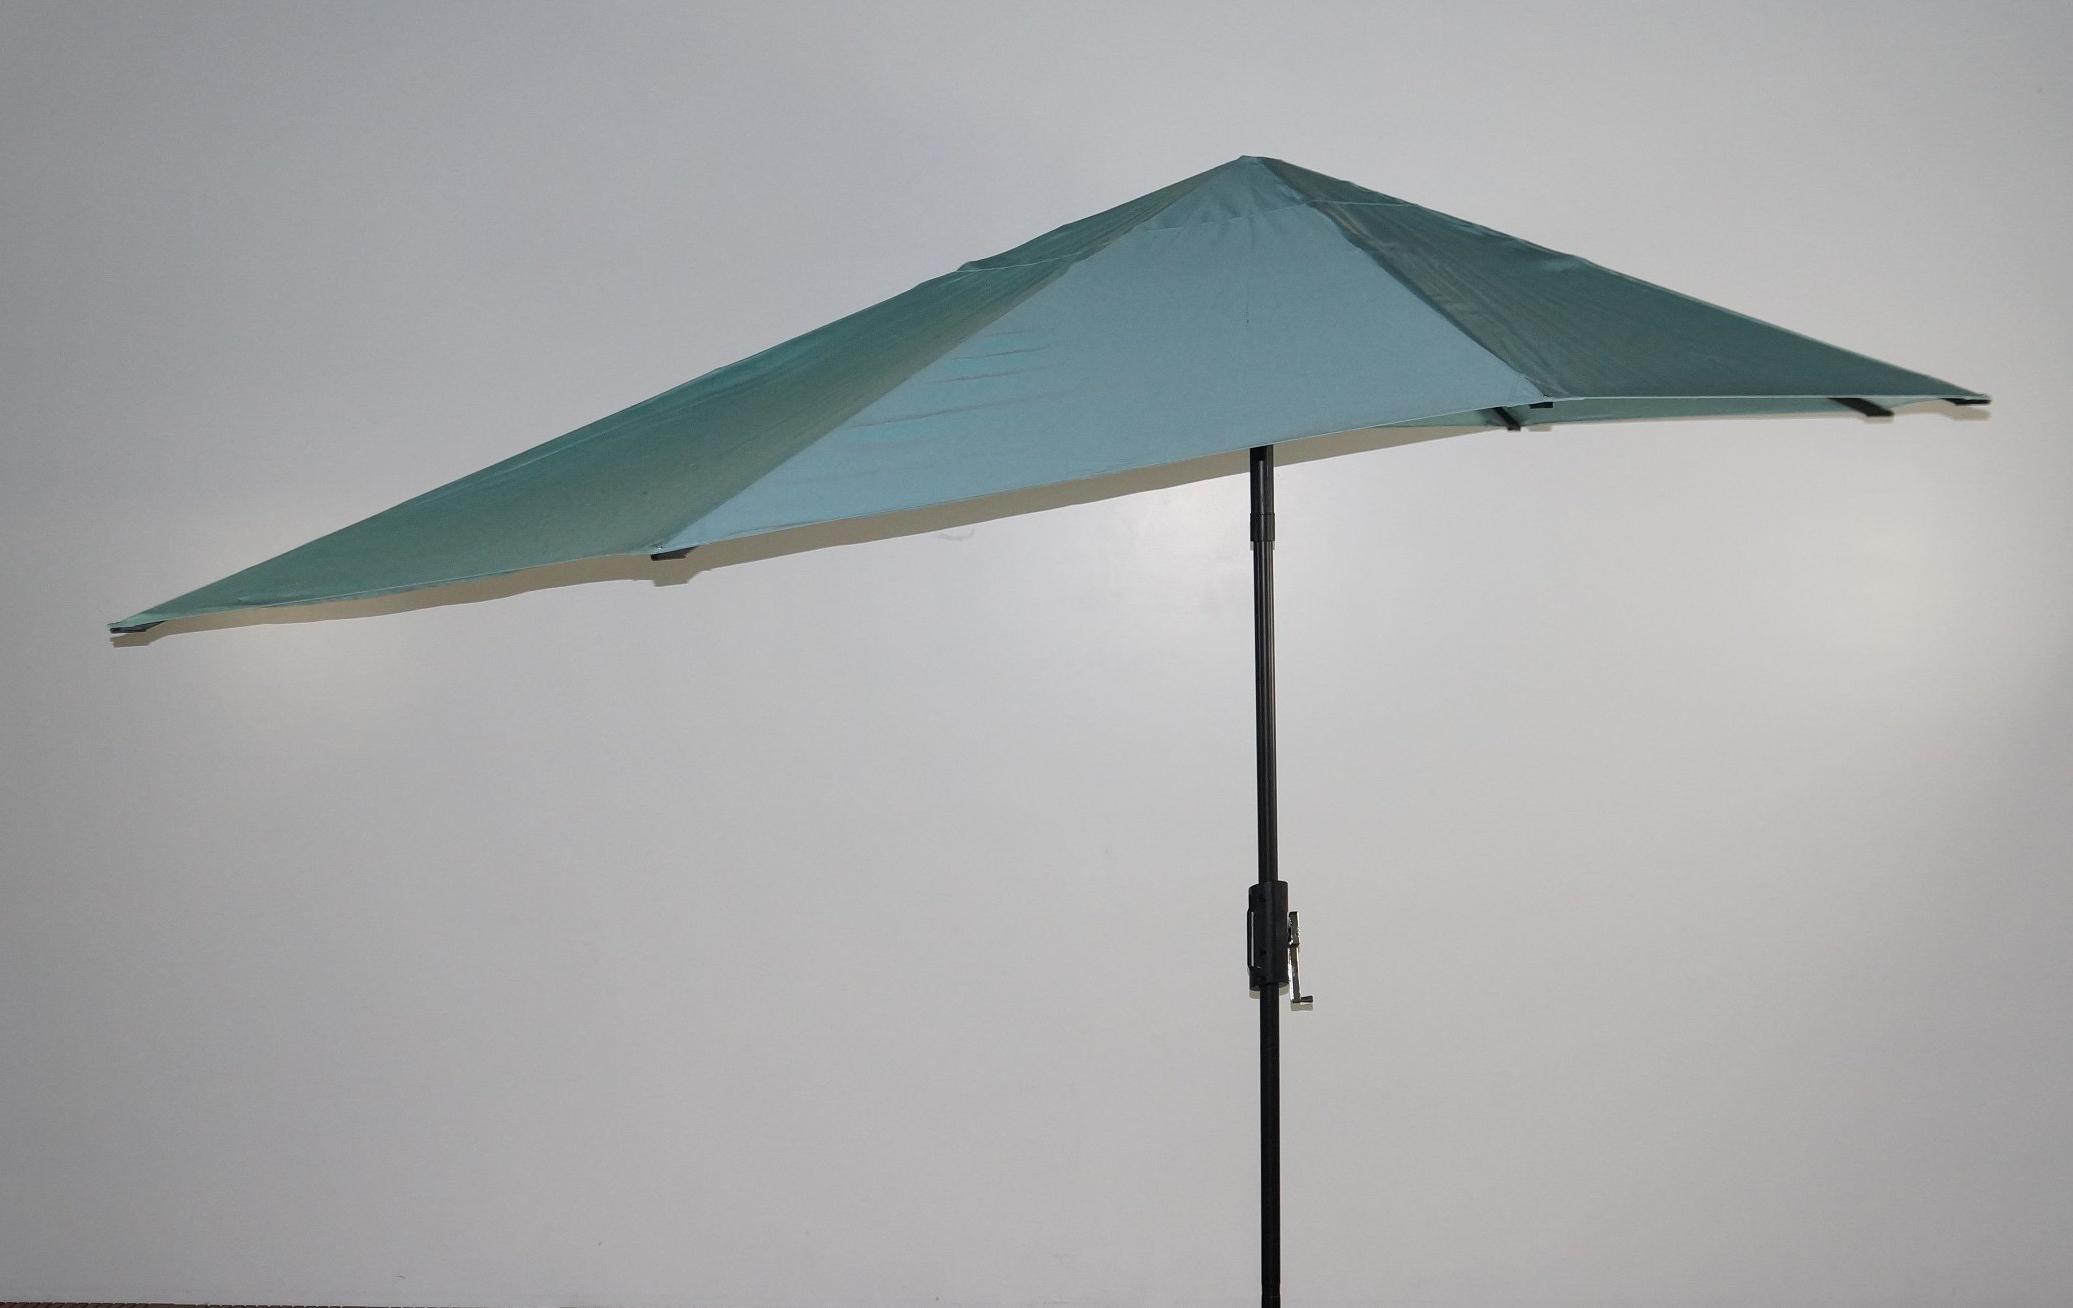 Madalyn Rectangular Market Sunbrella Umbrellas For Newest 16' Market Umbrella (View 5 of 20)